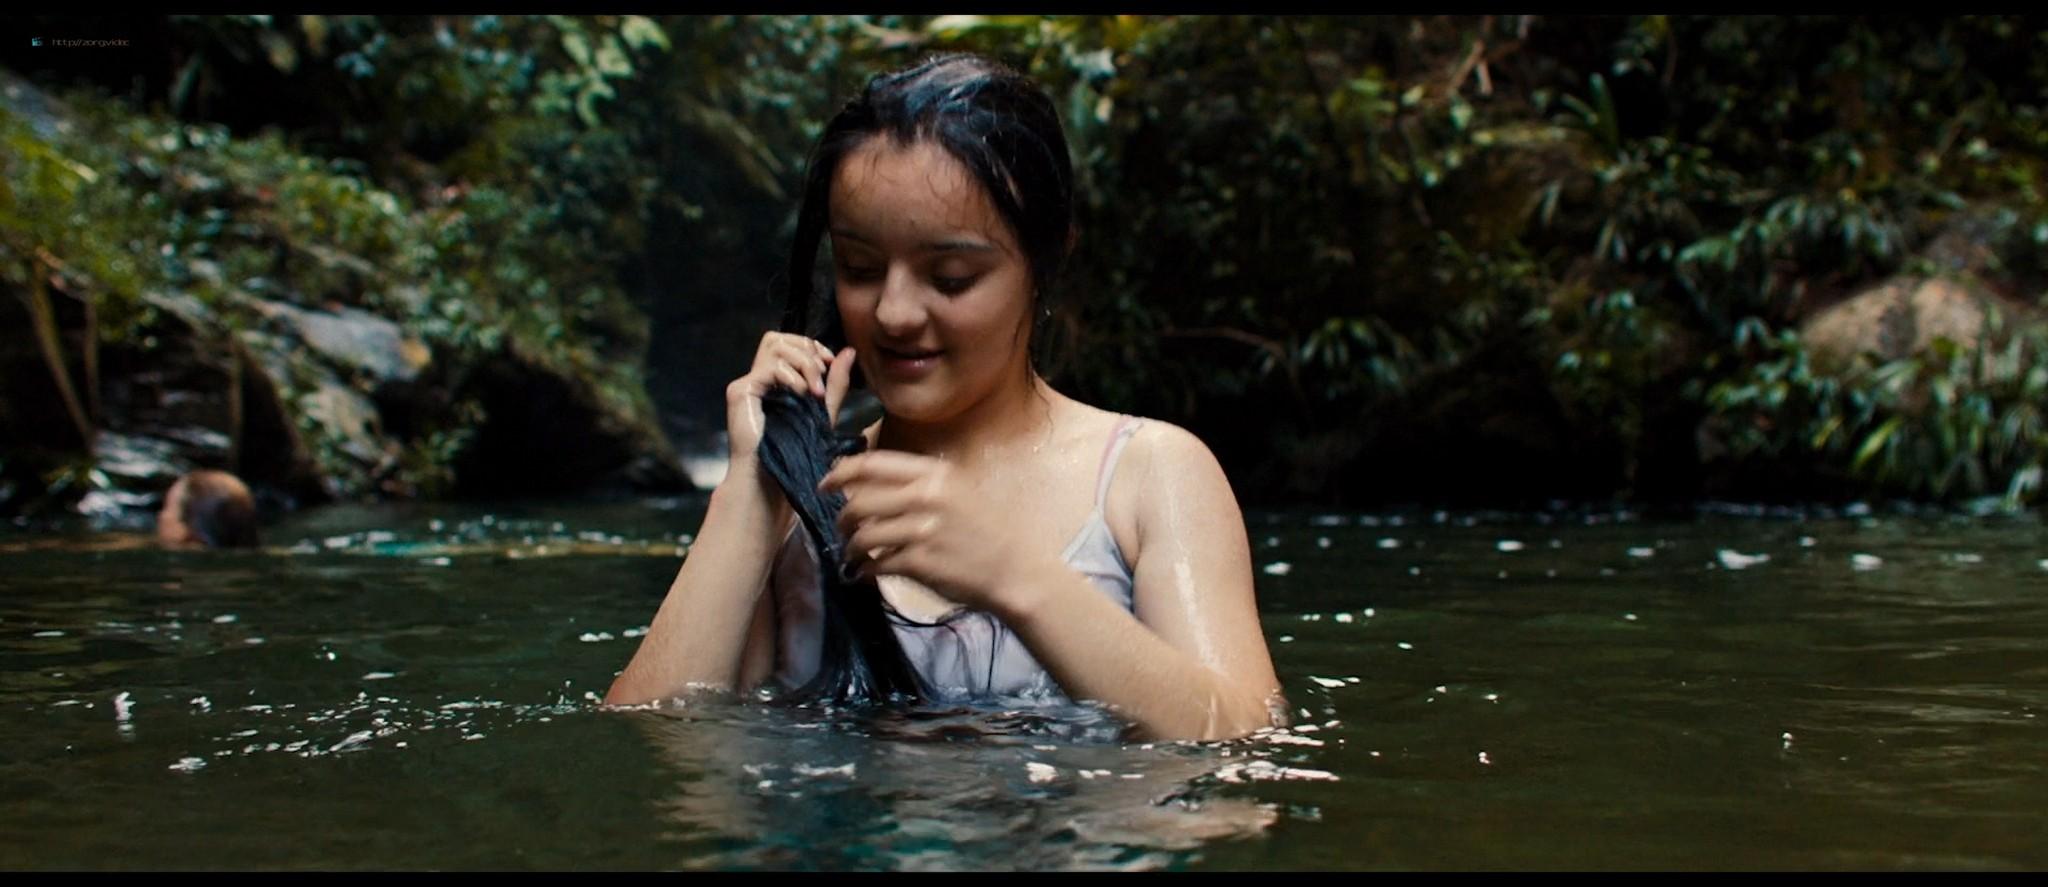 Julianne Nicholson pokies Karen Quintero, Laura Castrillón sexy - Monos (2019) HD 1080p BluRay (4)